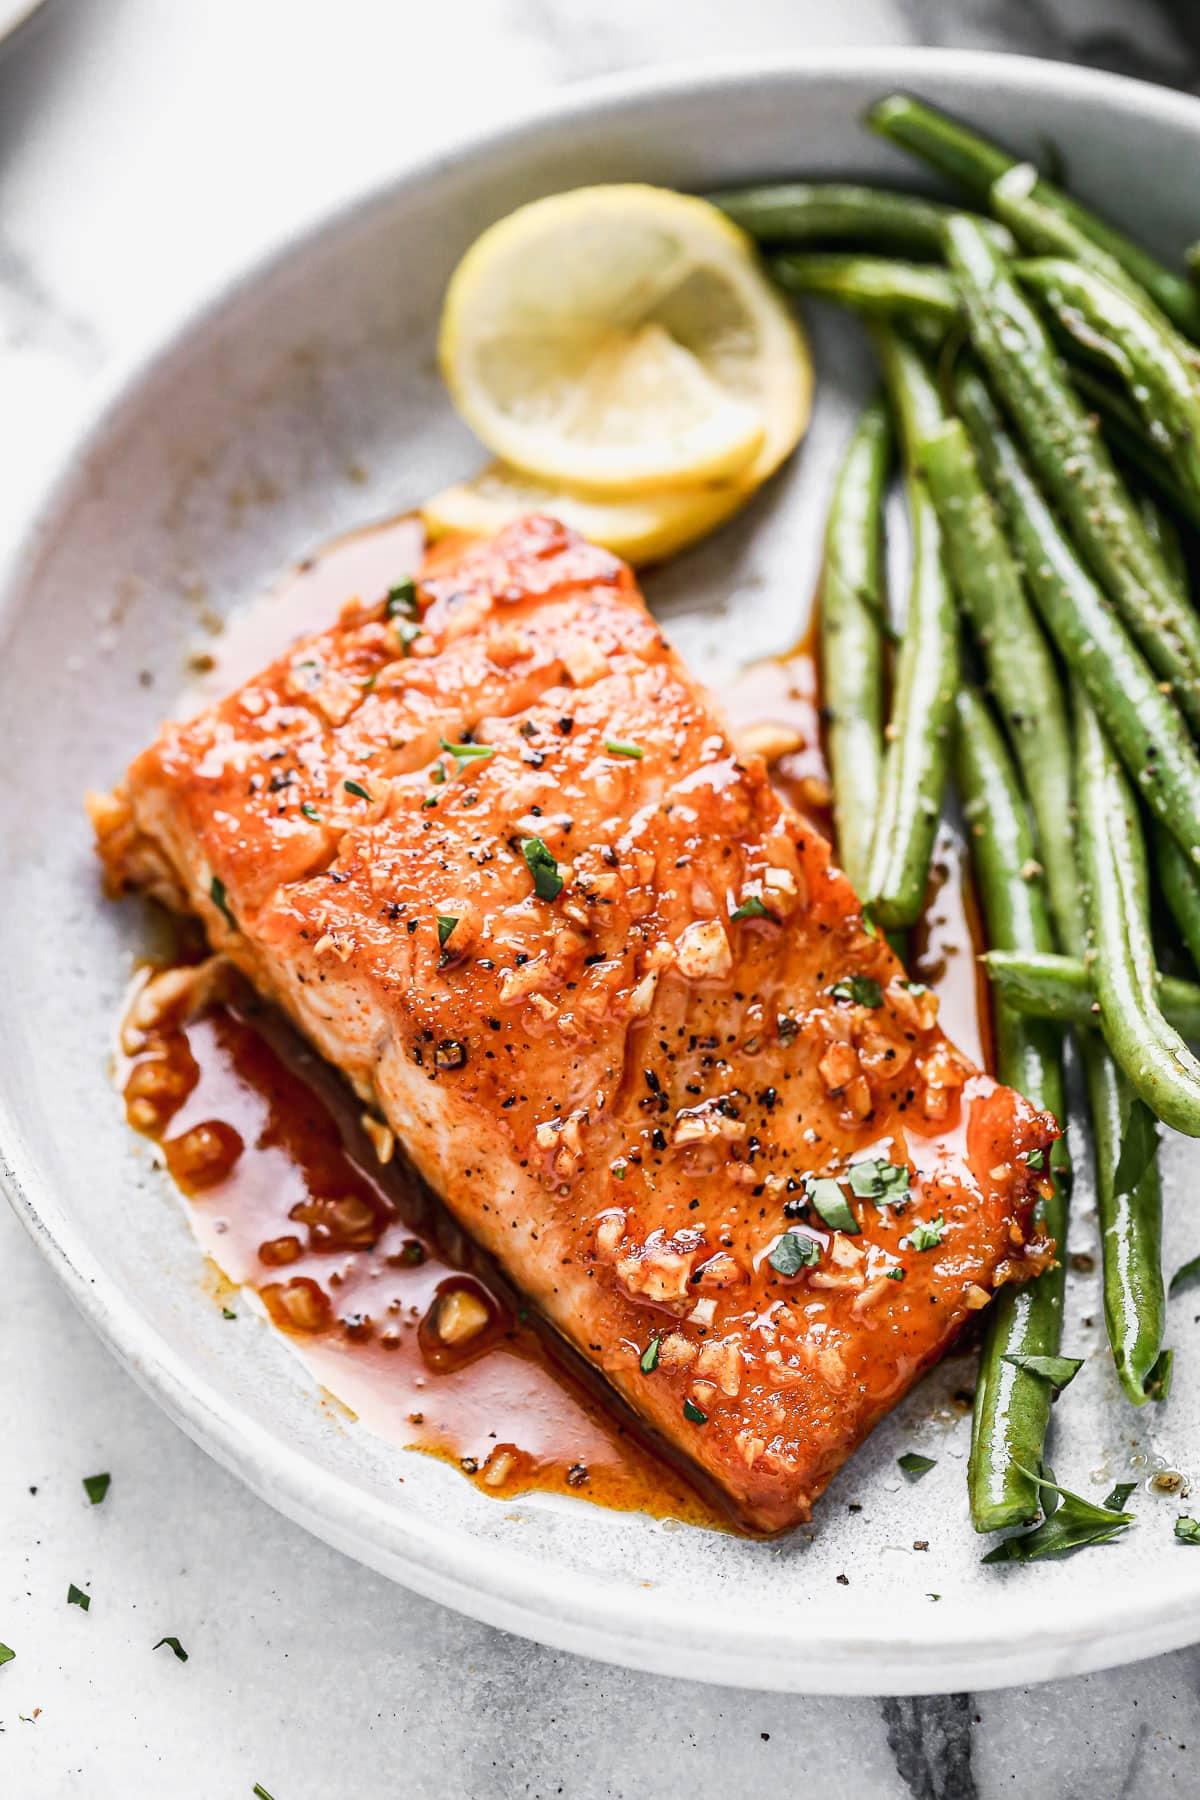 Saucy honey garlic salmon on a plate